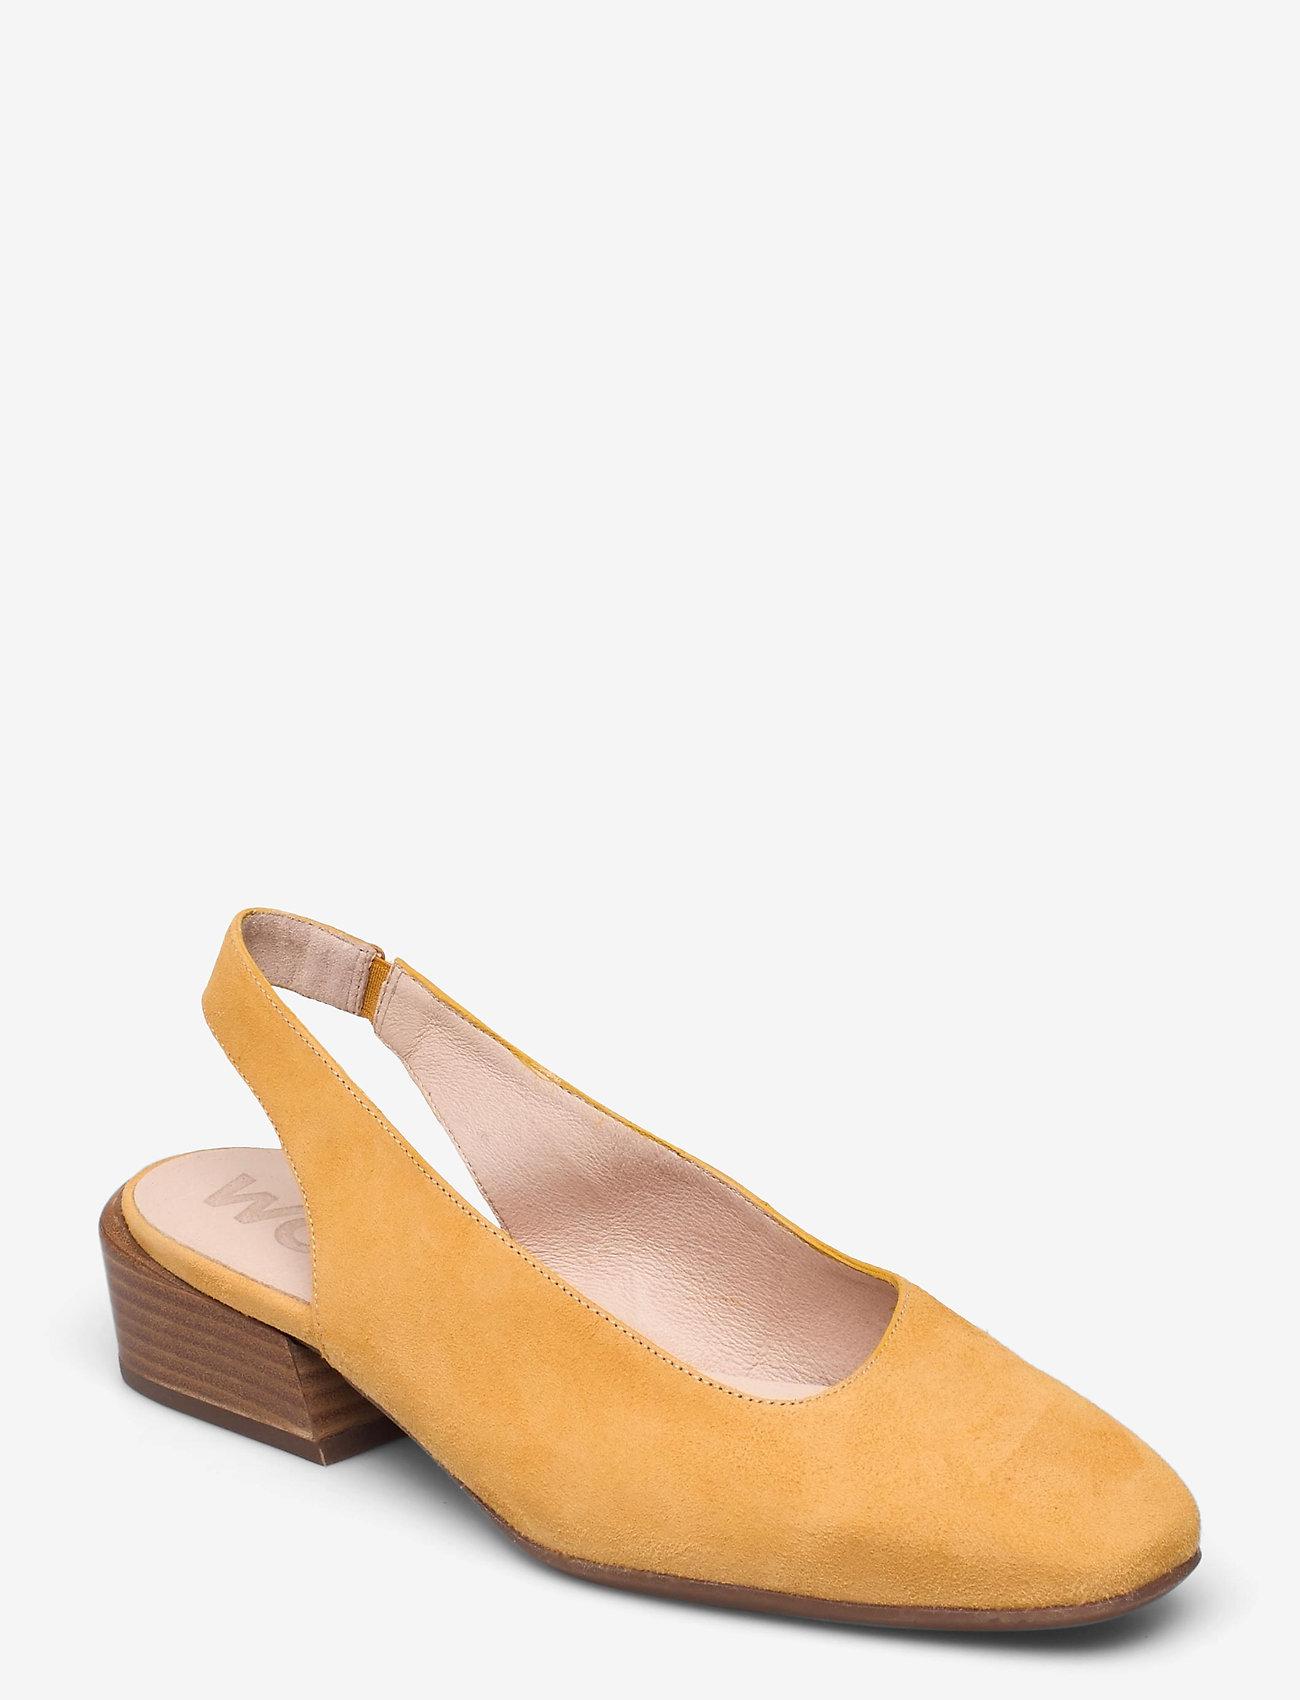 Wonders - C-6313 ANTE - sling backs - yellow - 0